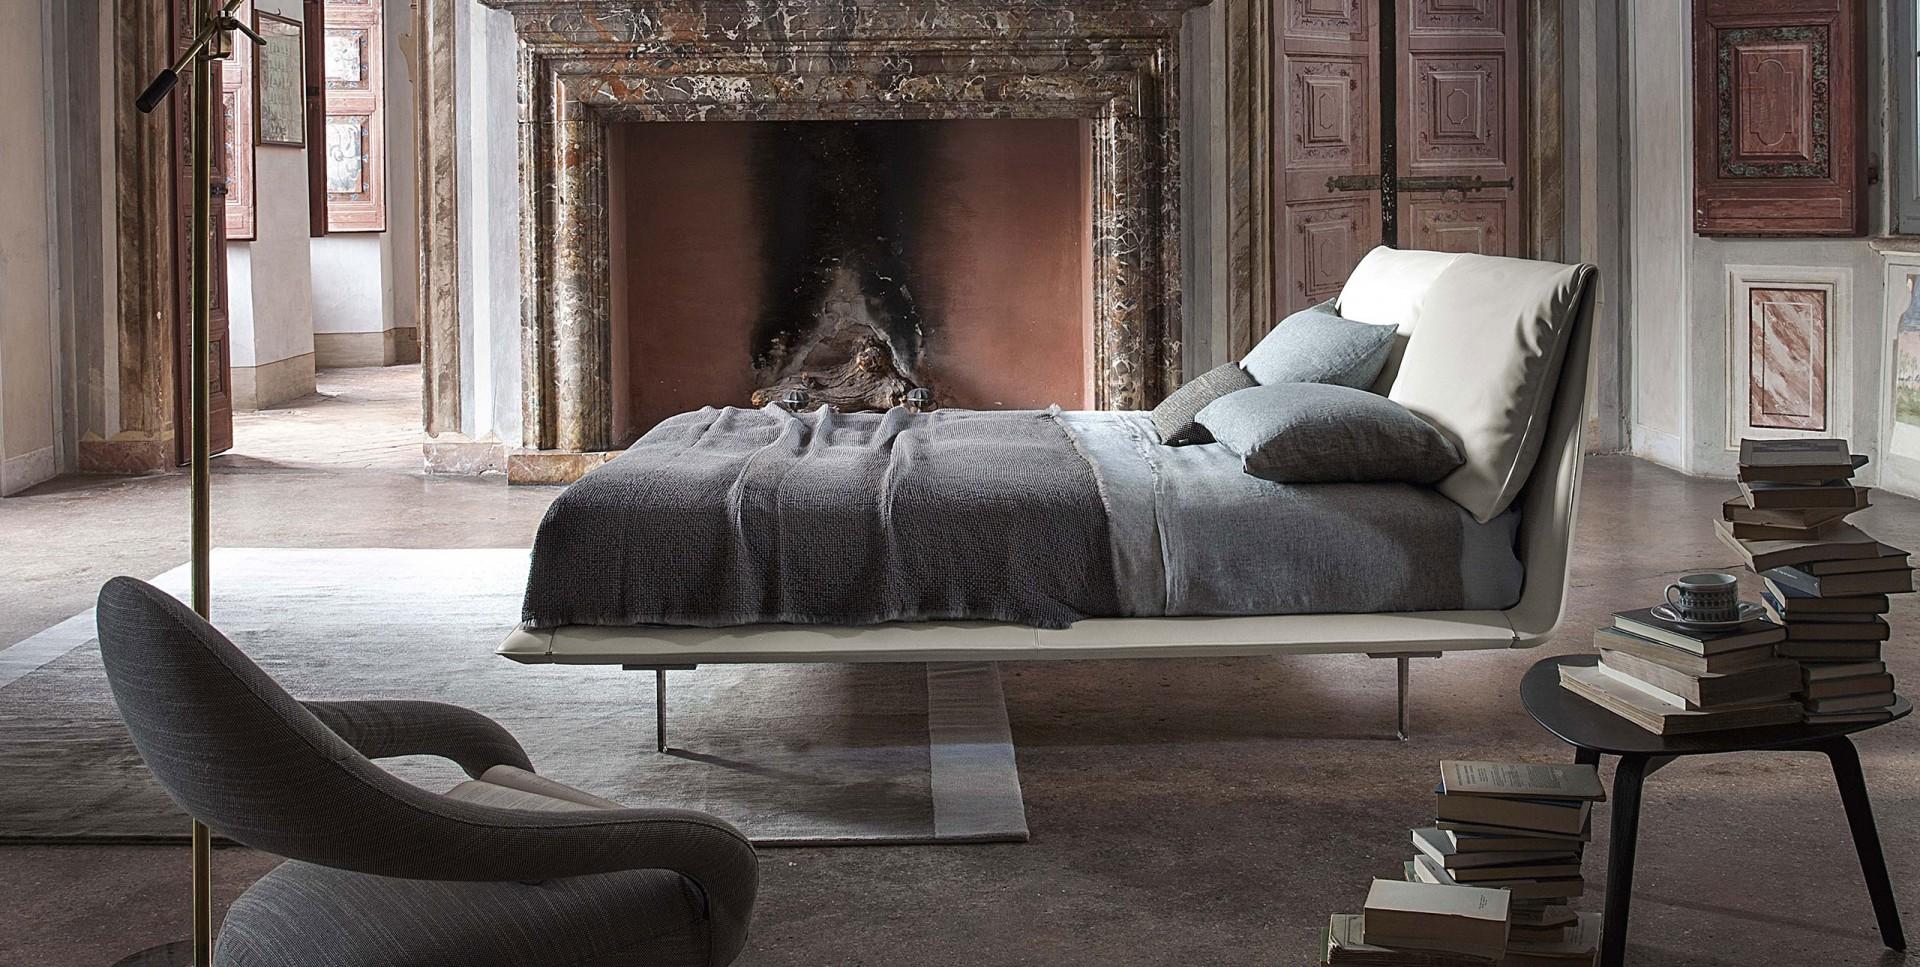 Łóżko John-John firmy Poltrona Frau. Projekt: Jean-Marie Massaud. Fot. Poltrona Frau